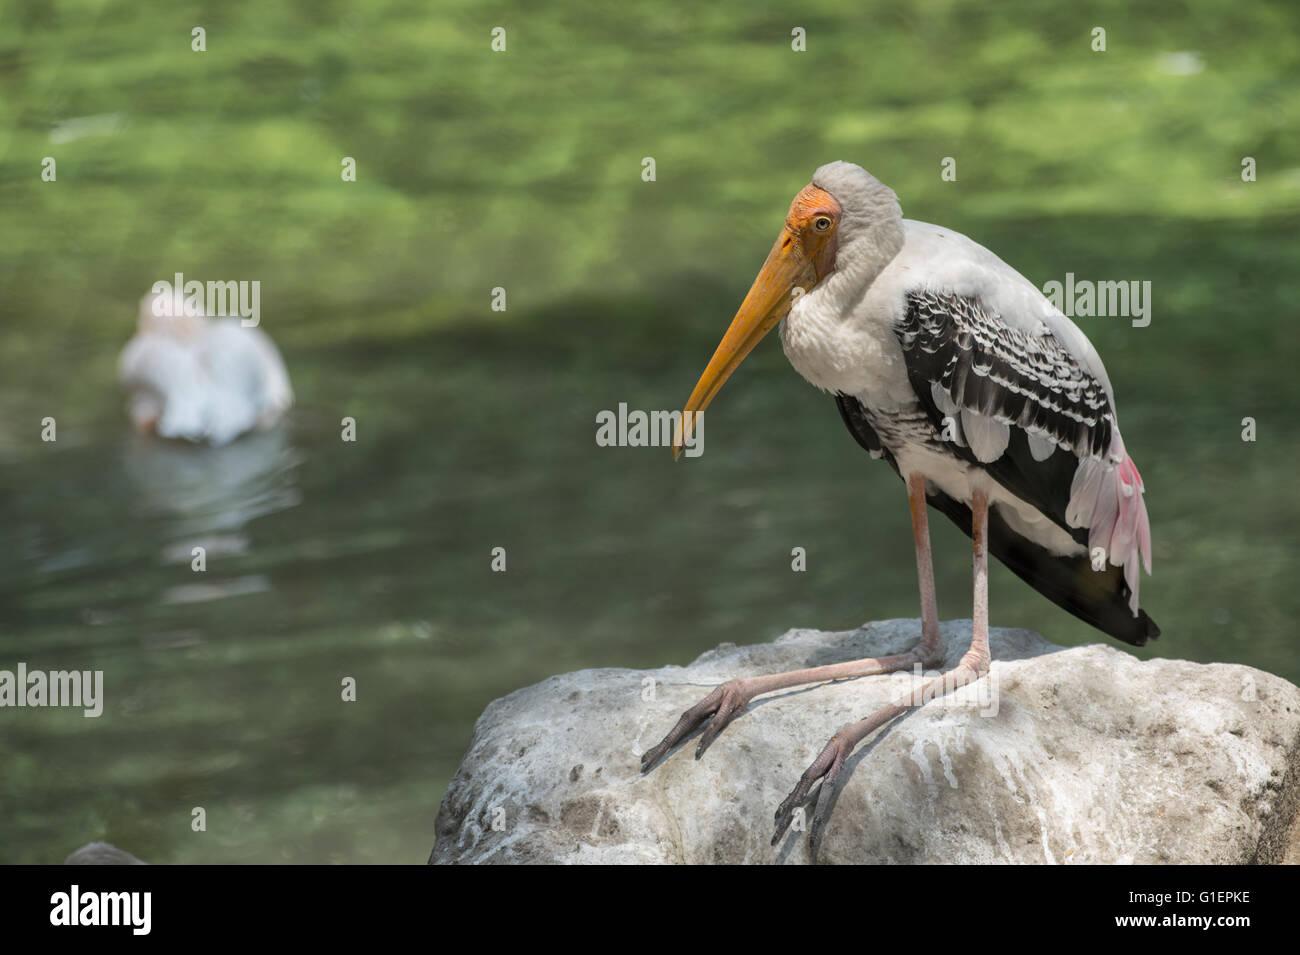 Painted stork, Mycteria leucocephala, Ciconiidae, Asia Stock Photo